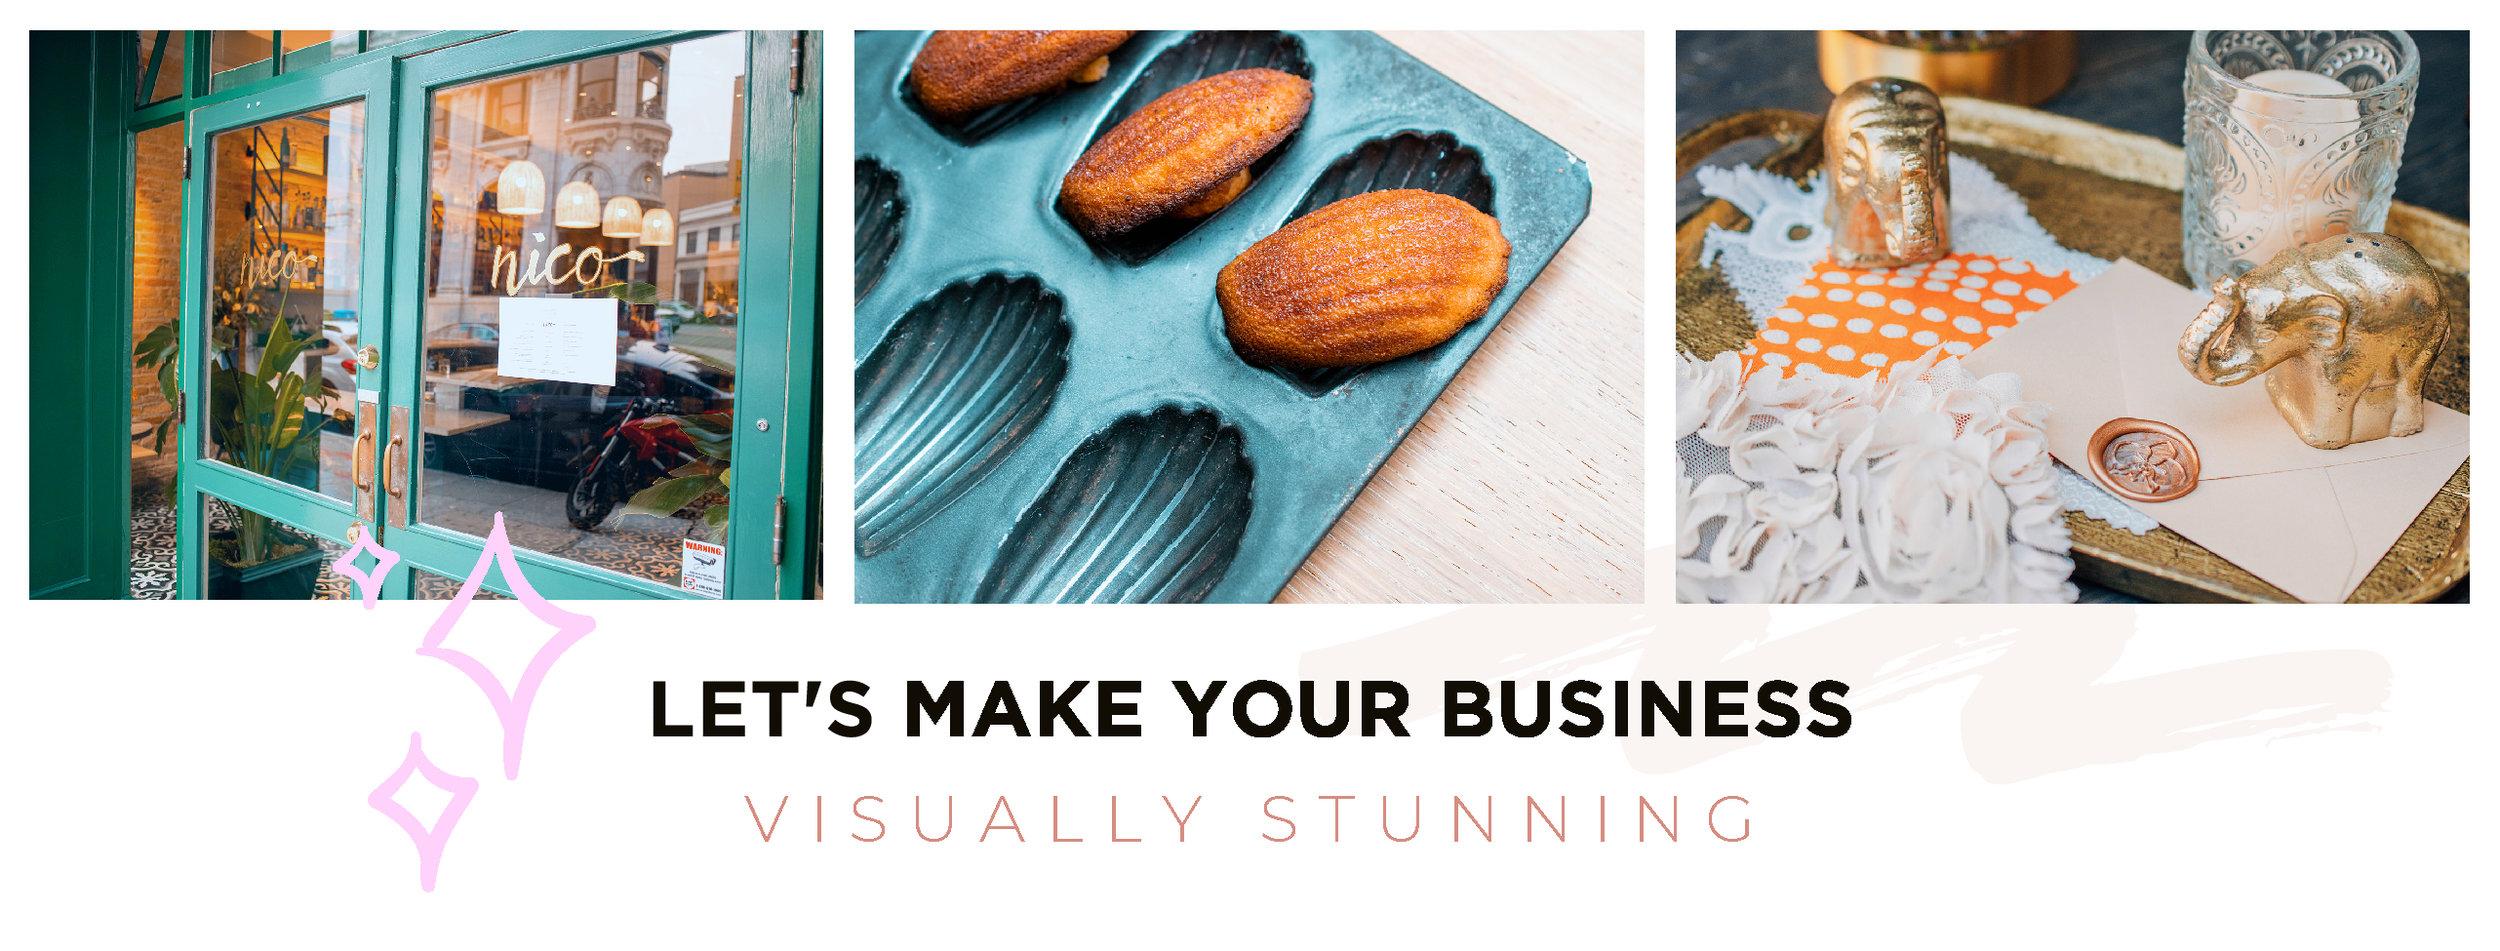 LET'S MAKE YOUR BUSINESS.jpg